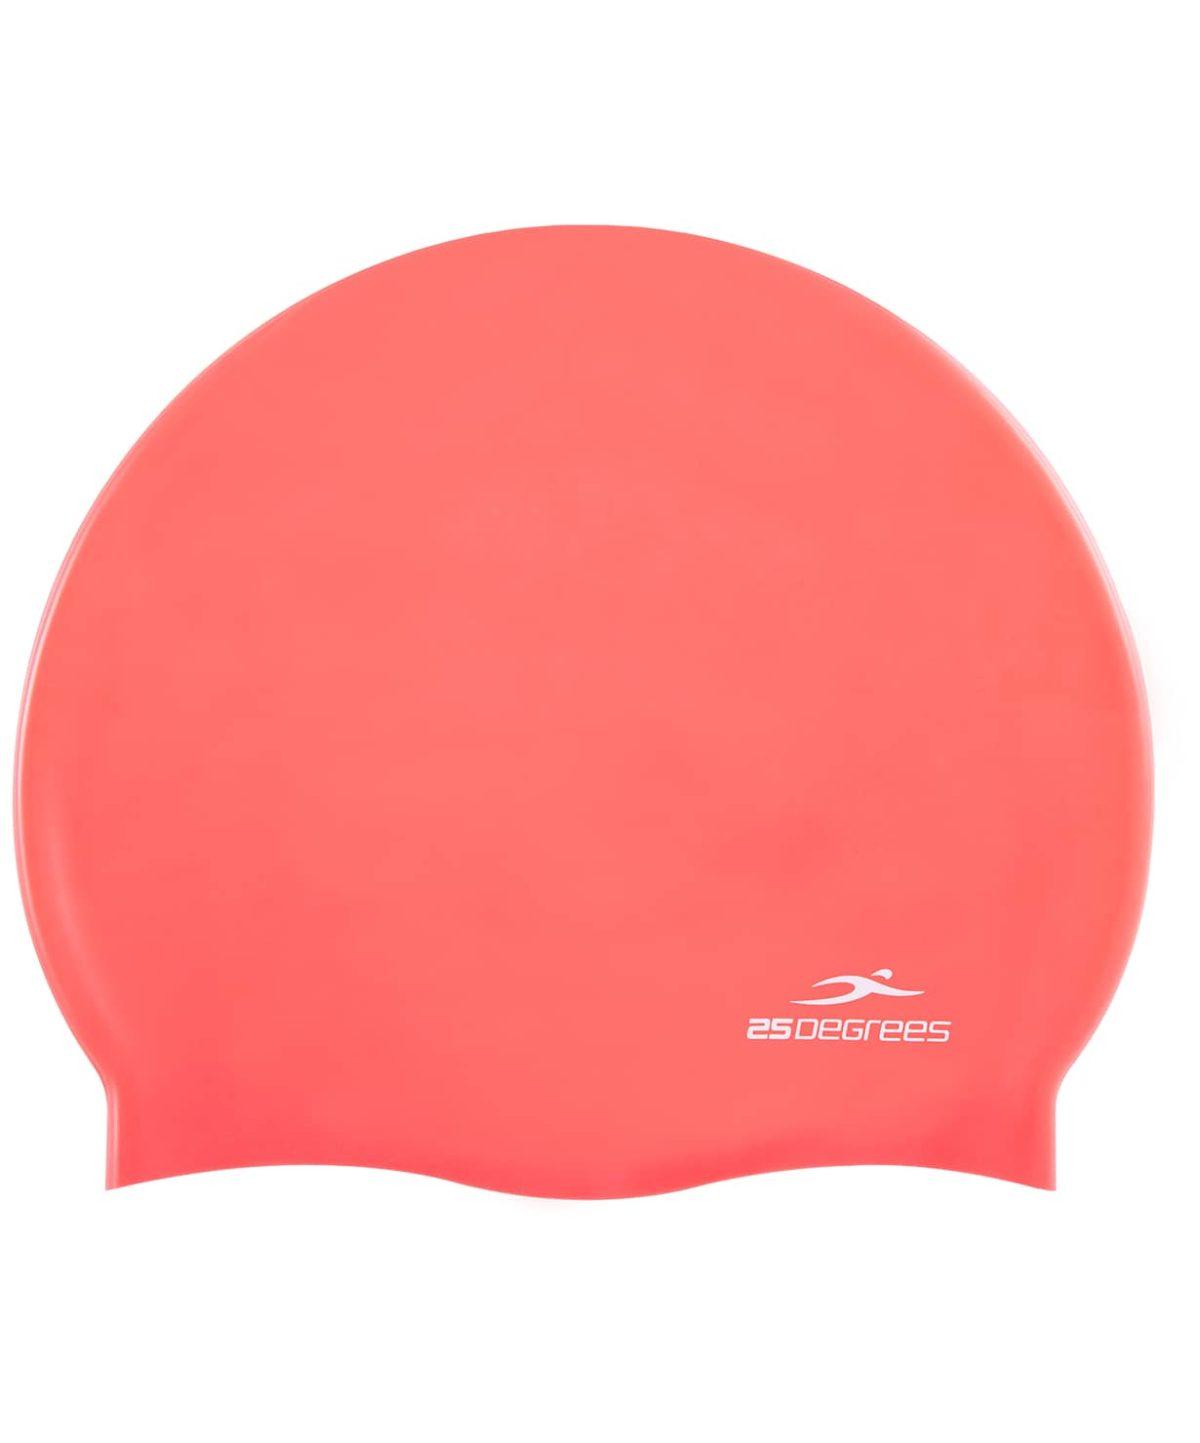 25DEGREES Шапочка для плавания Nuance, силикон 25D15-NU-20-30: розовый - 1